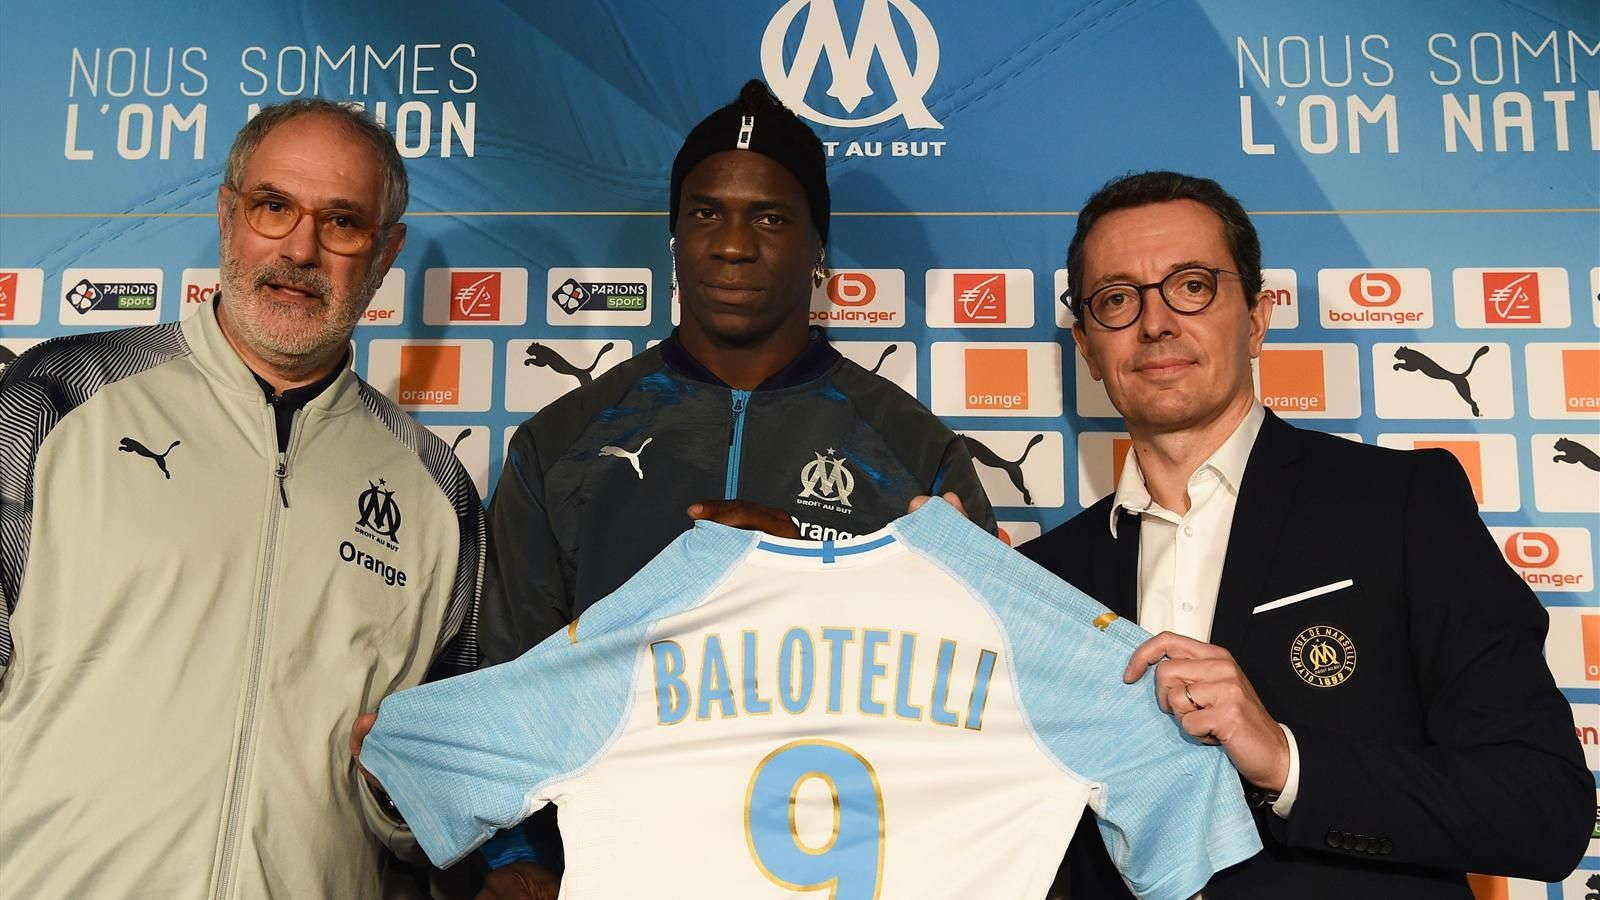 Balotelli : Saya Tahu Akan Bermain Di Marseille